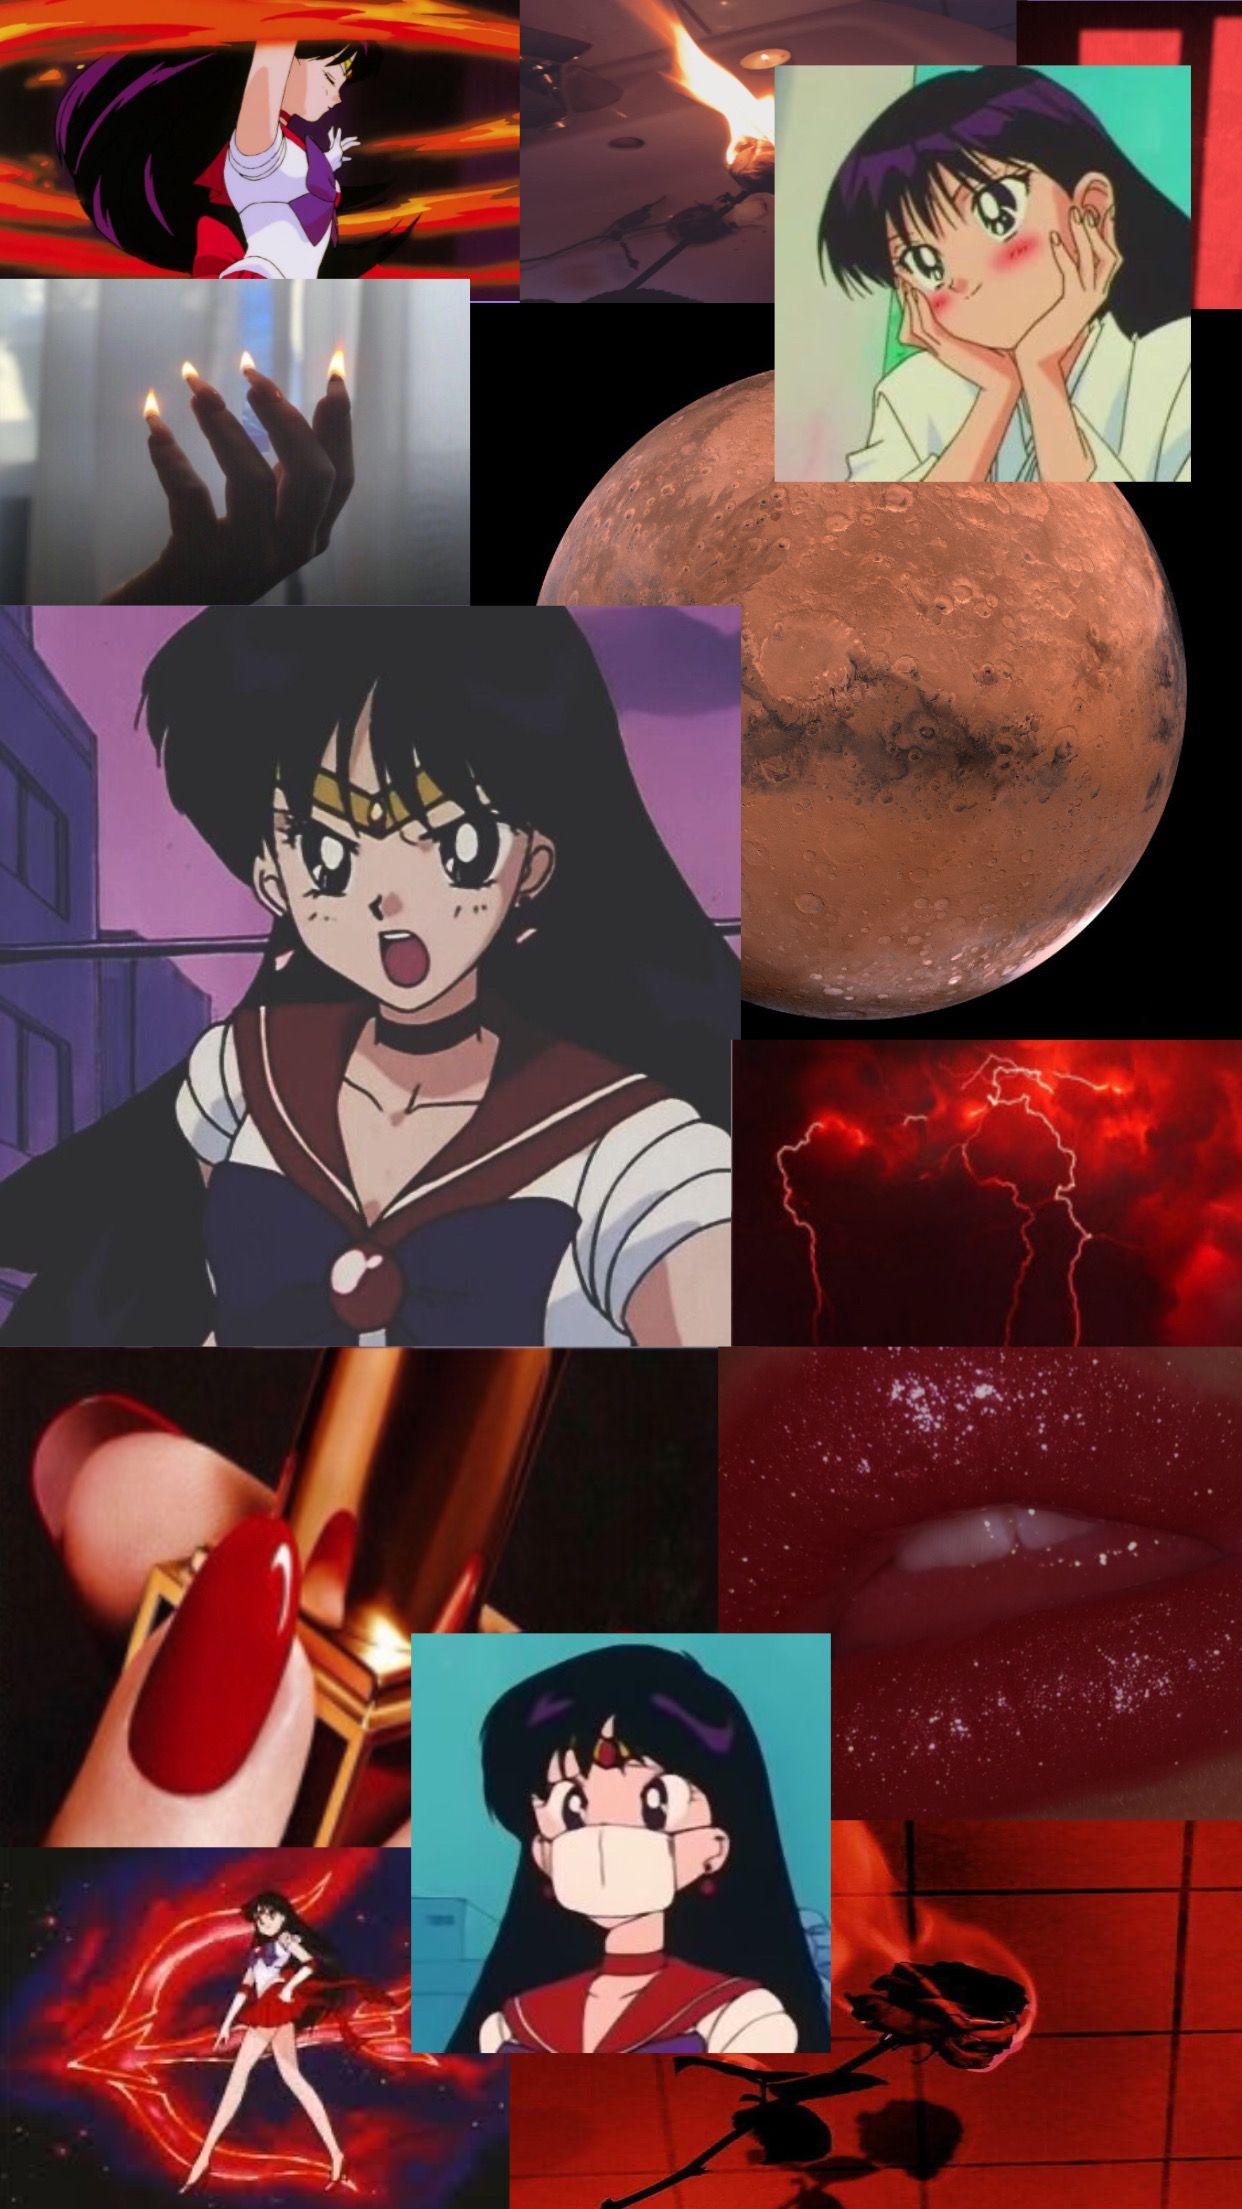 Sailor Mars Aesthetic Wallpaper Sailor Moon Sailor Moon Aesthetic Sailor Mars Sailor Moon